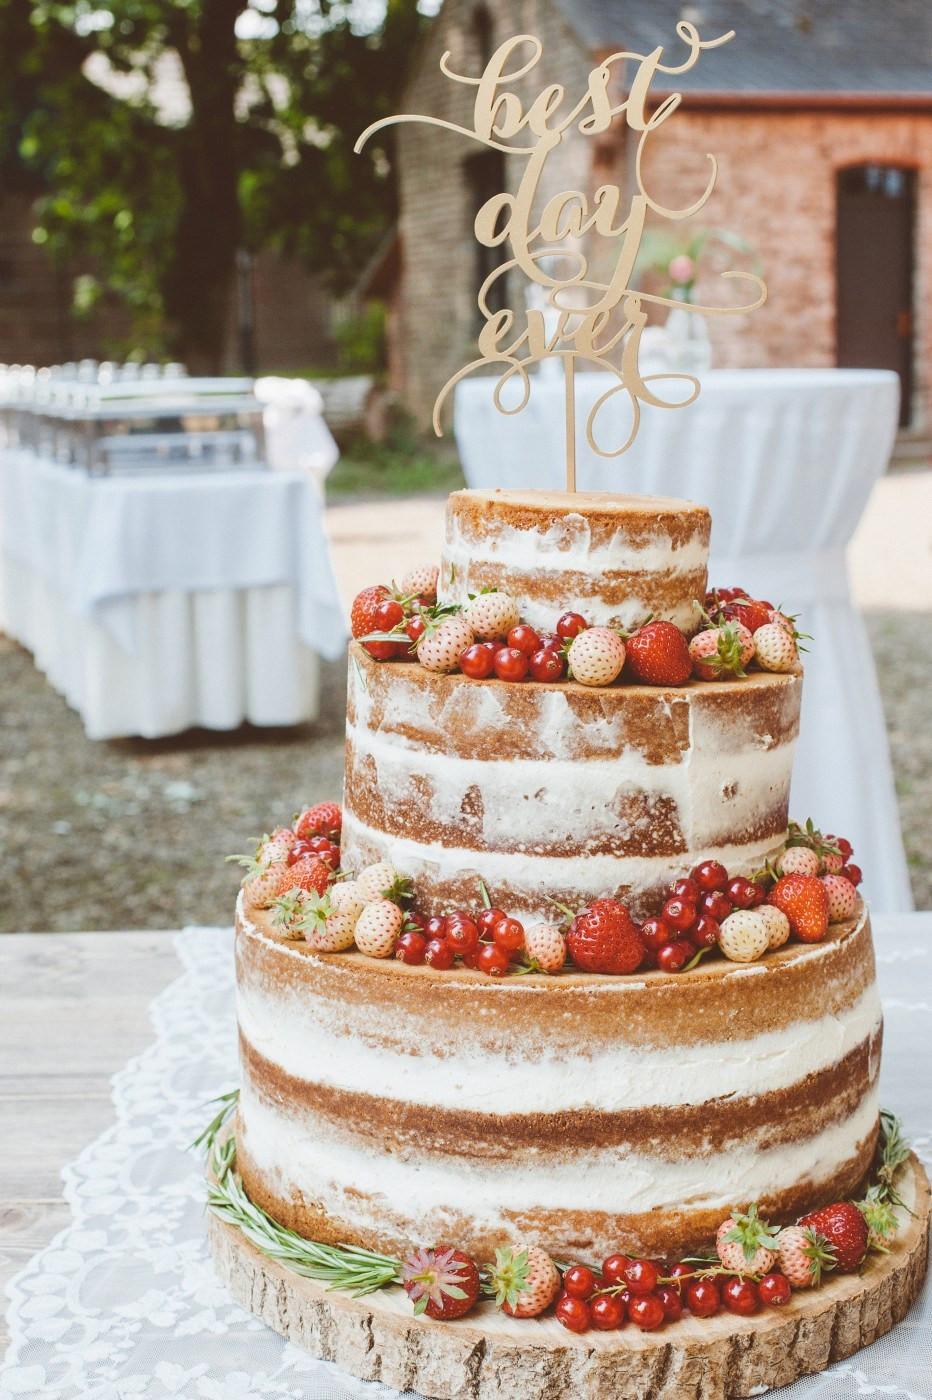 Naked Cake Hochzeitstorte  Very Berry Wedding Cake Rezept Hochzeitstorte Rezept